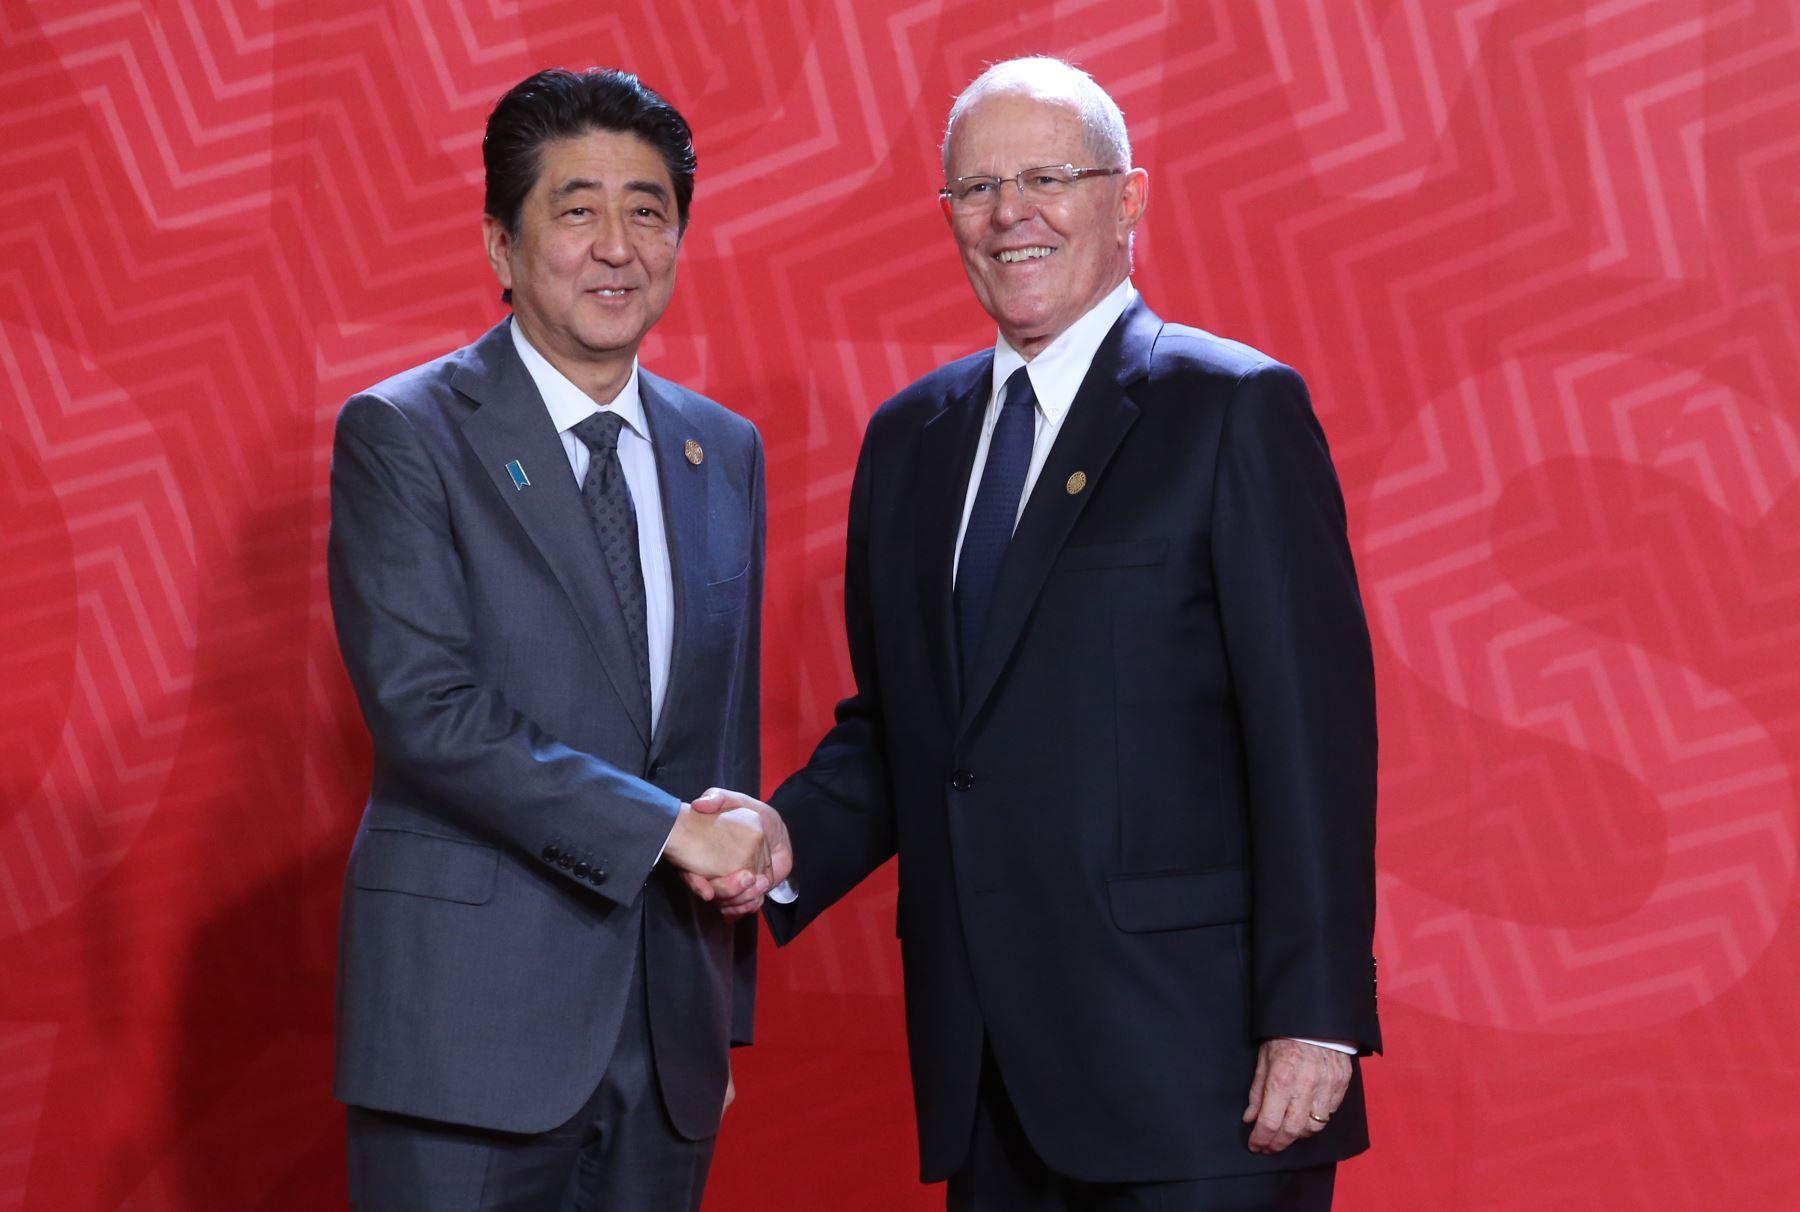 LIMA PERÚ, NOVIEMBRE 19. Presidente Pedro Pablo Kuczynski da la bienvenida al Primer Ministro de Japón, Shinzo Abe a la Cumbre APEC 2016. Foto: ANDINA/Melina Mejía